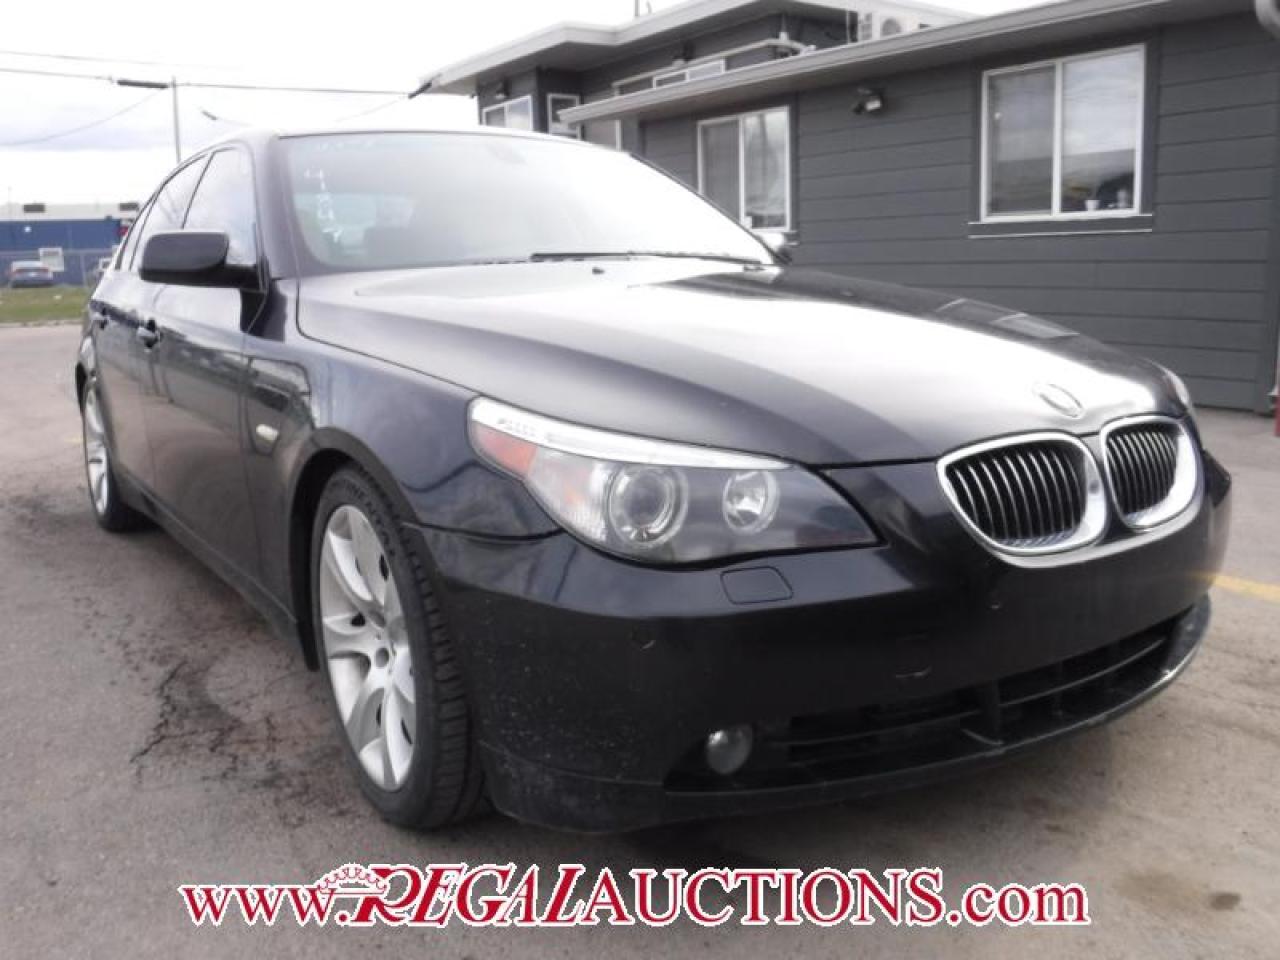 Photo of Black 2007 BMW 5 SERIES 550I 4D SEDAN